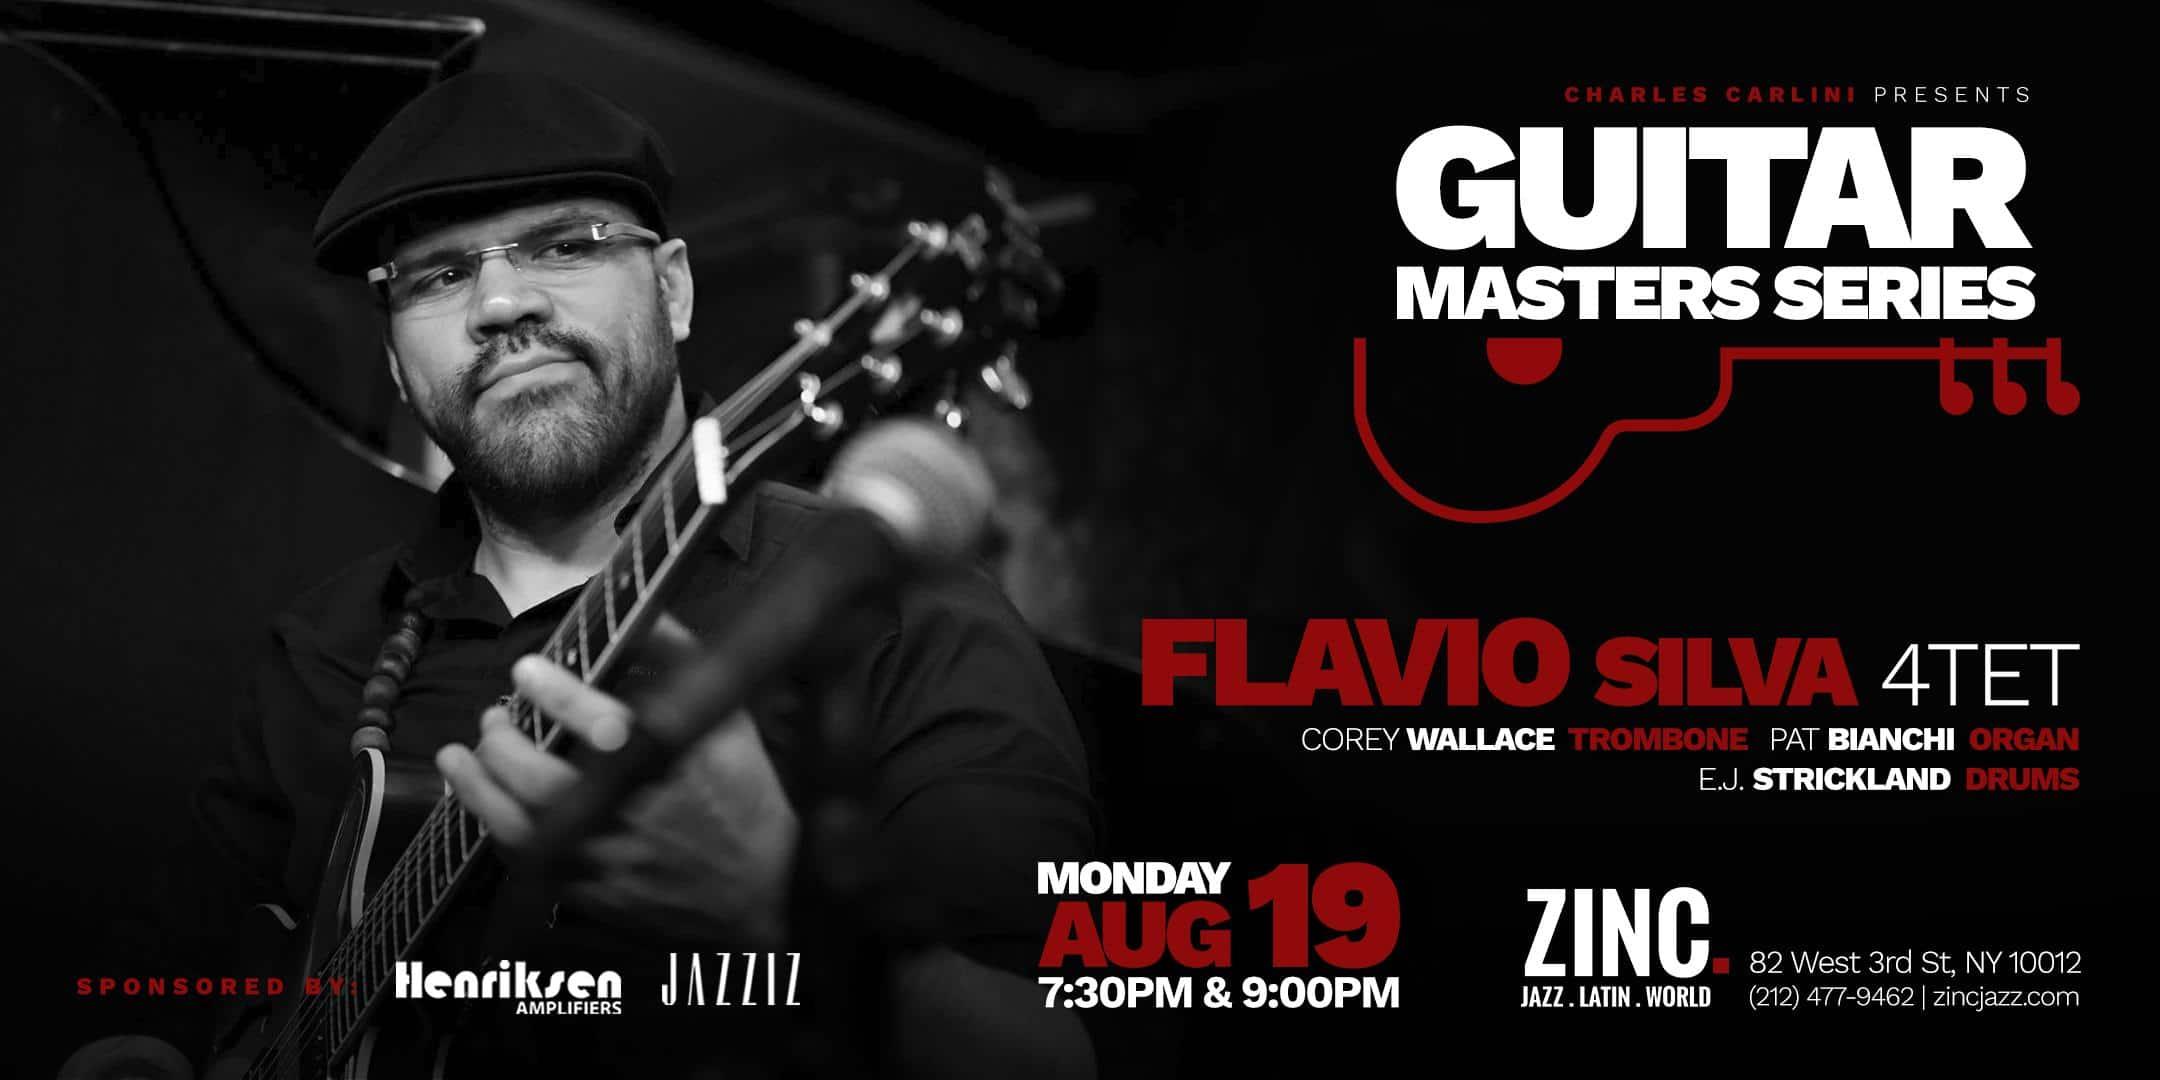 Guitar Masters Series: Flavio Silva